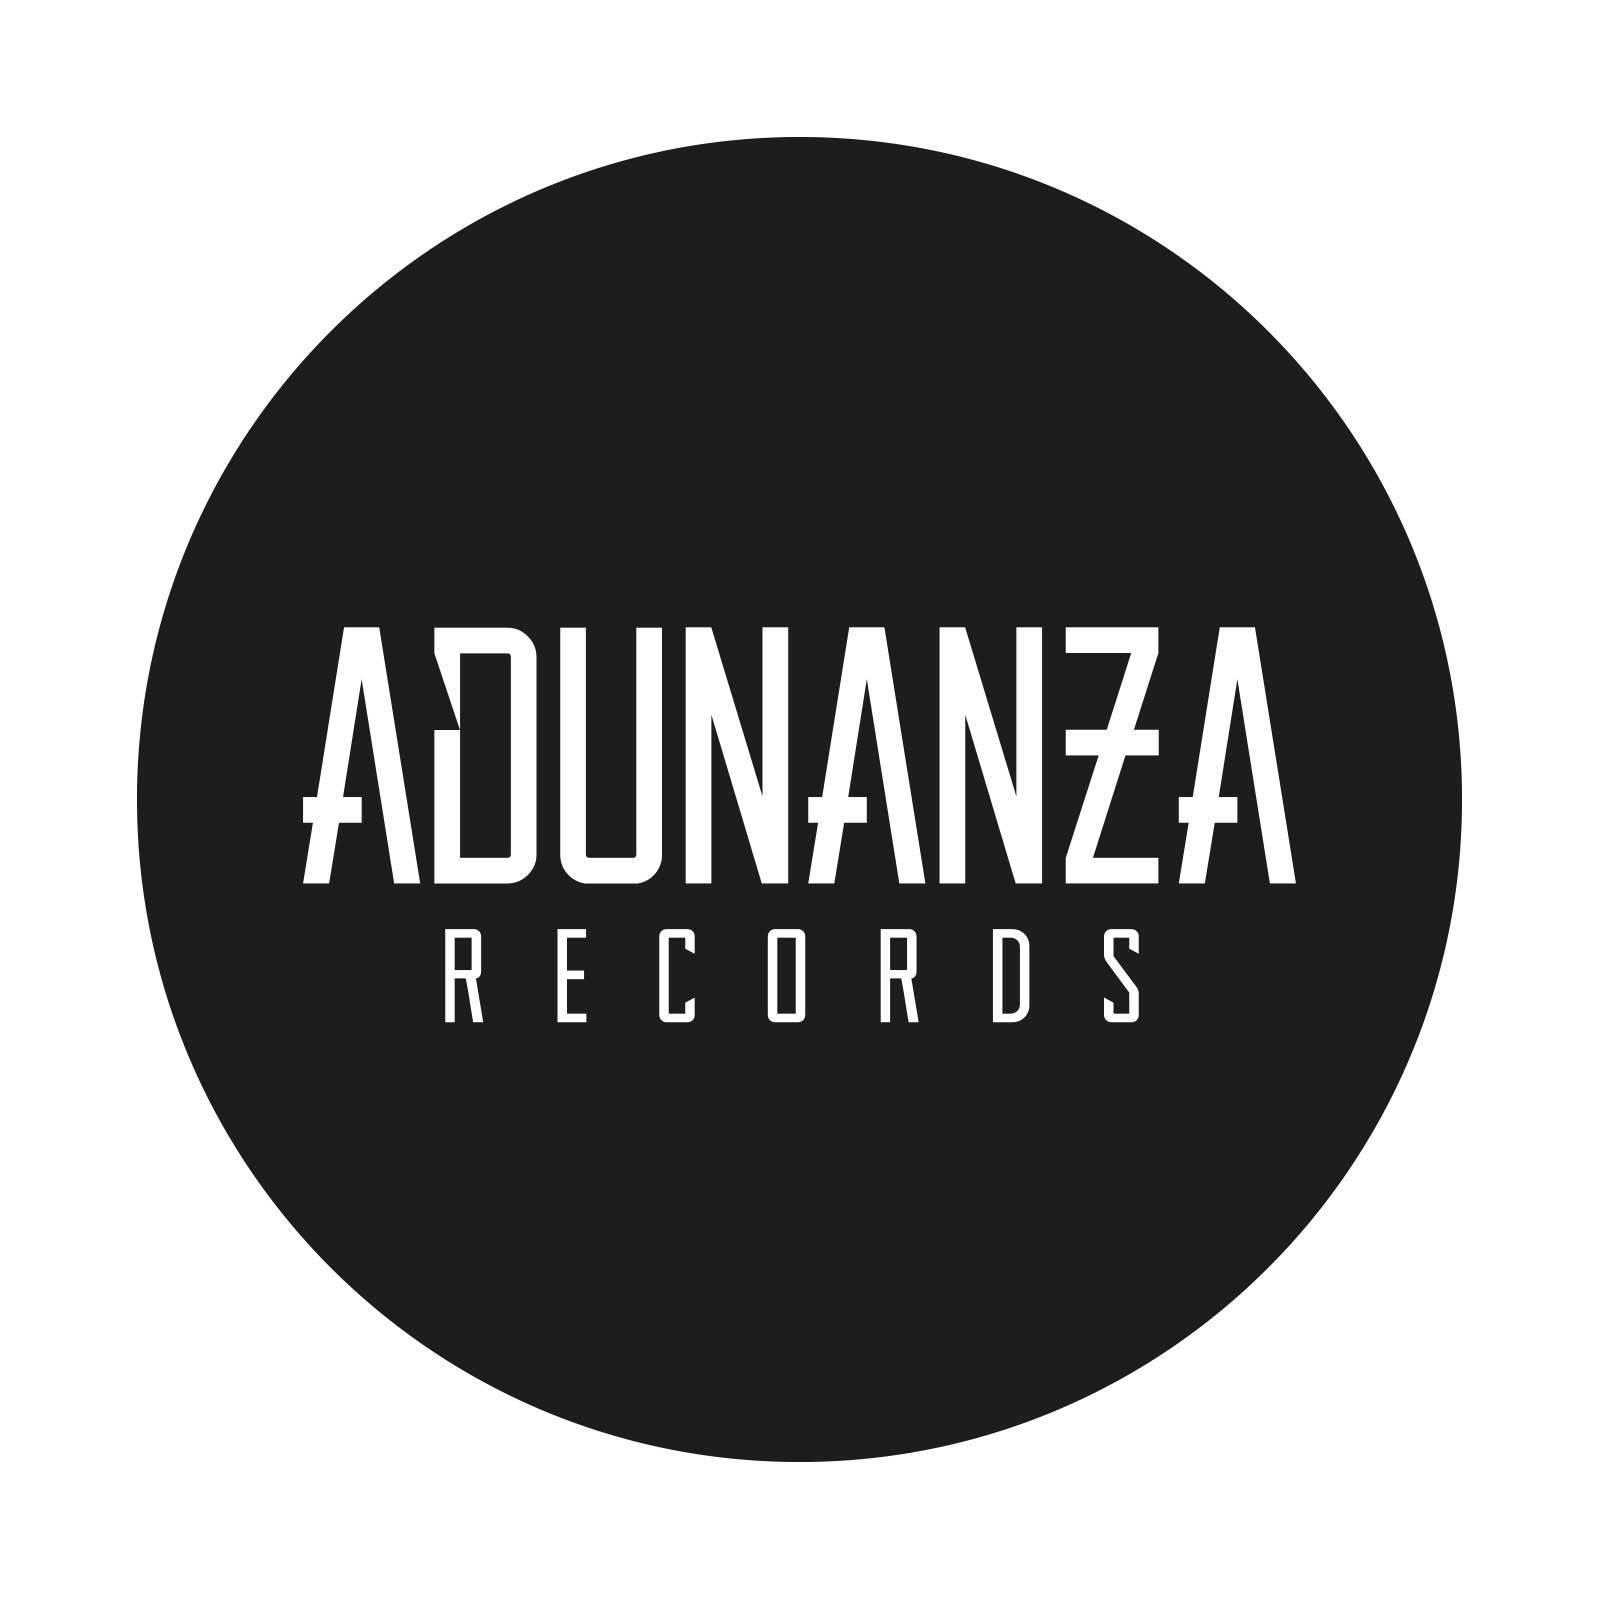 Adunanza Records: Miki Stentella & Francesco Romano - Trend, Nicola Baldacci, Francesco Romano - South Vibes